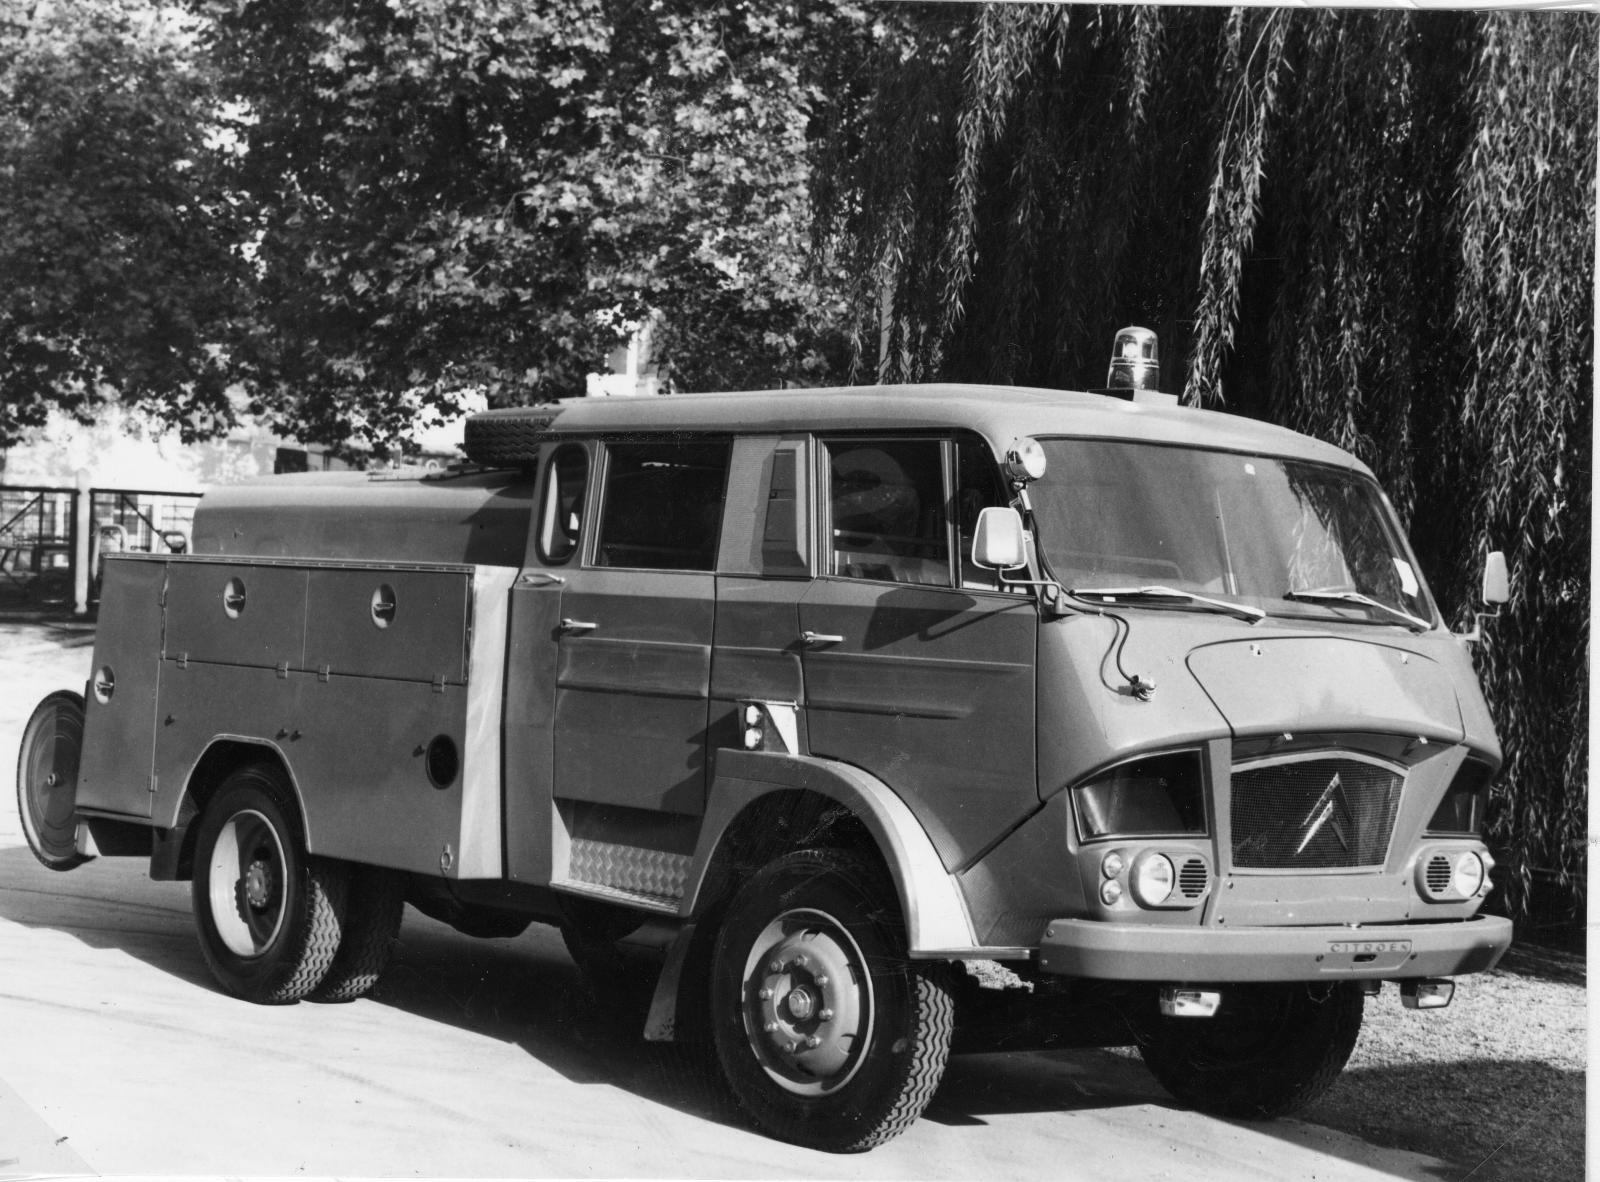 Citroën タイプ 700